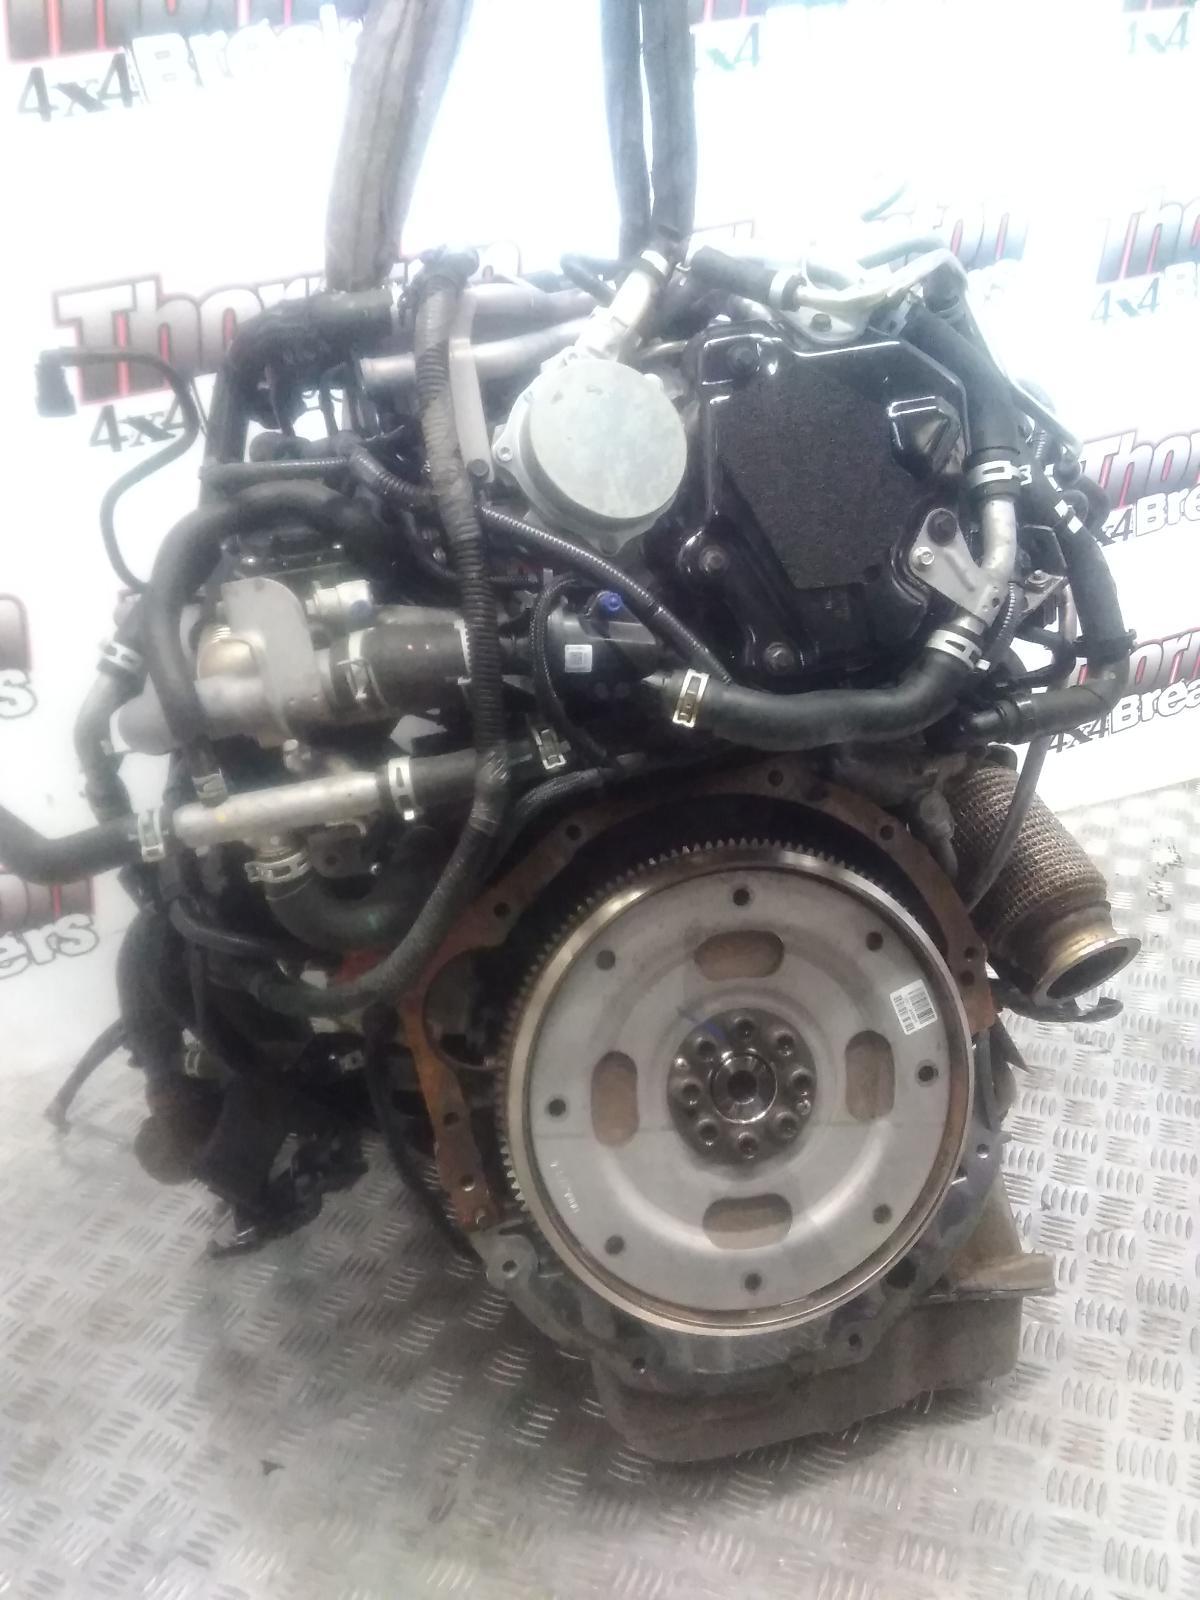 Image for a 2017 NISSAN NAVARA 2.3 Diesel YS23 Engine